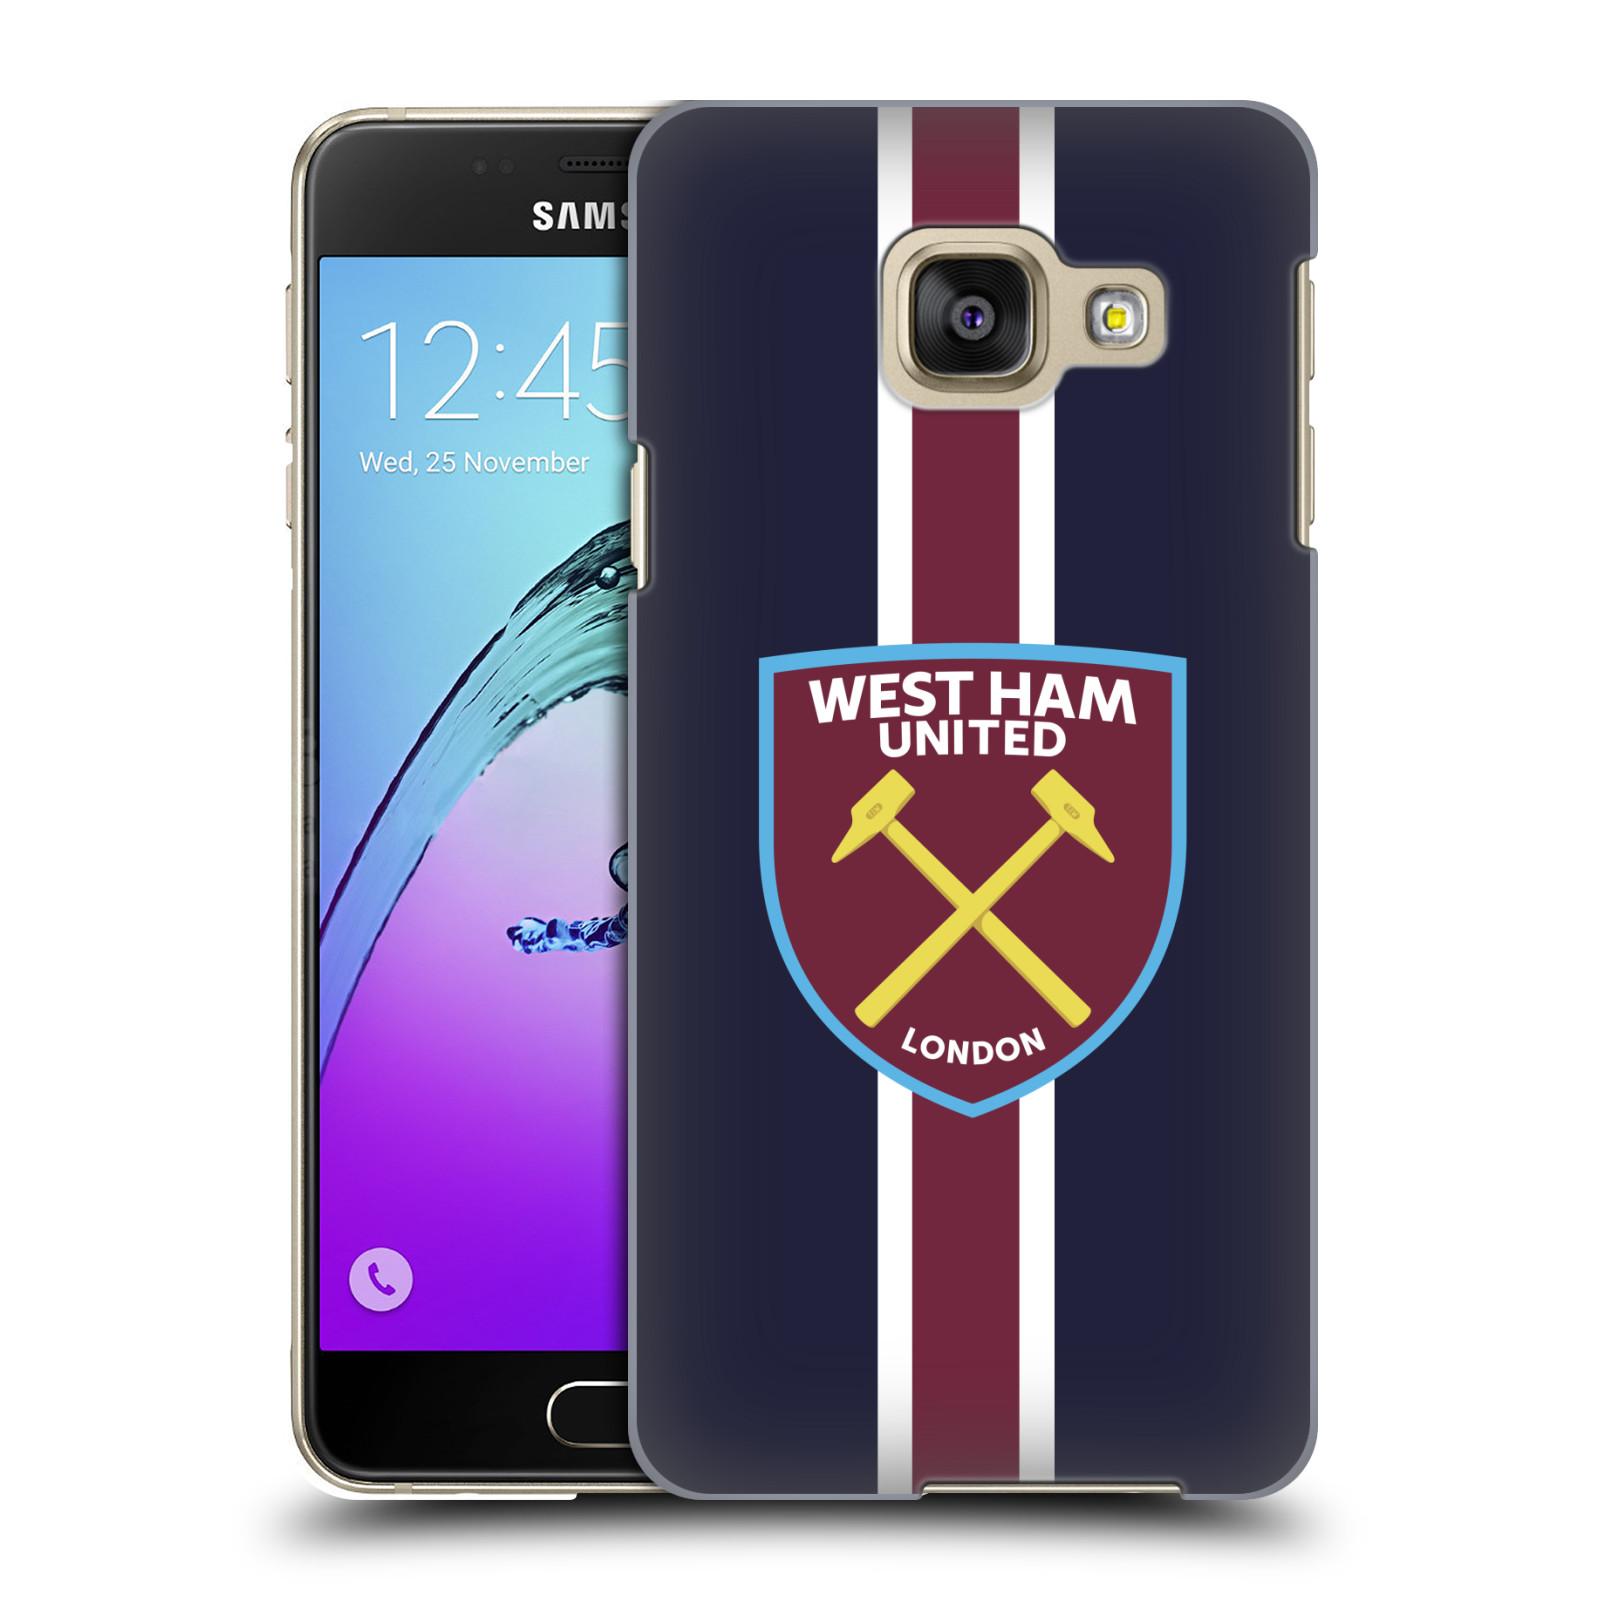 Plastové pouzdro na mobil Samsung Galaxy A3 (2016) - Head Case - West Ham United - Pruhy